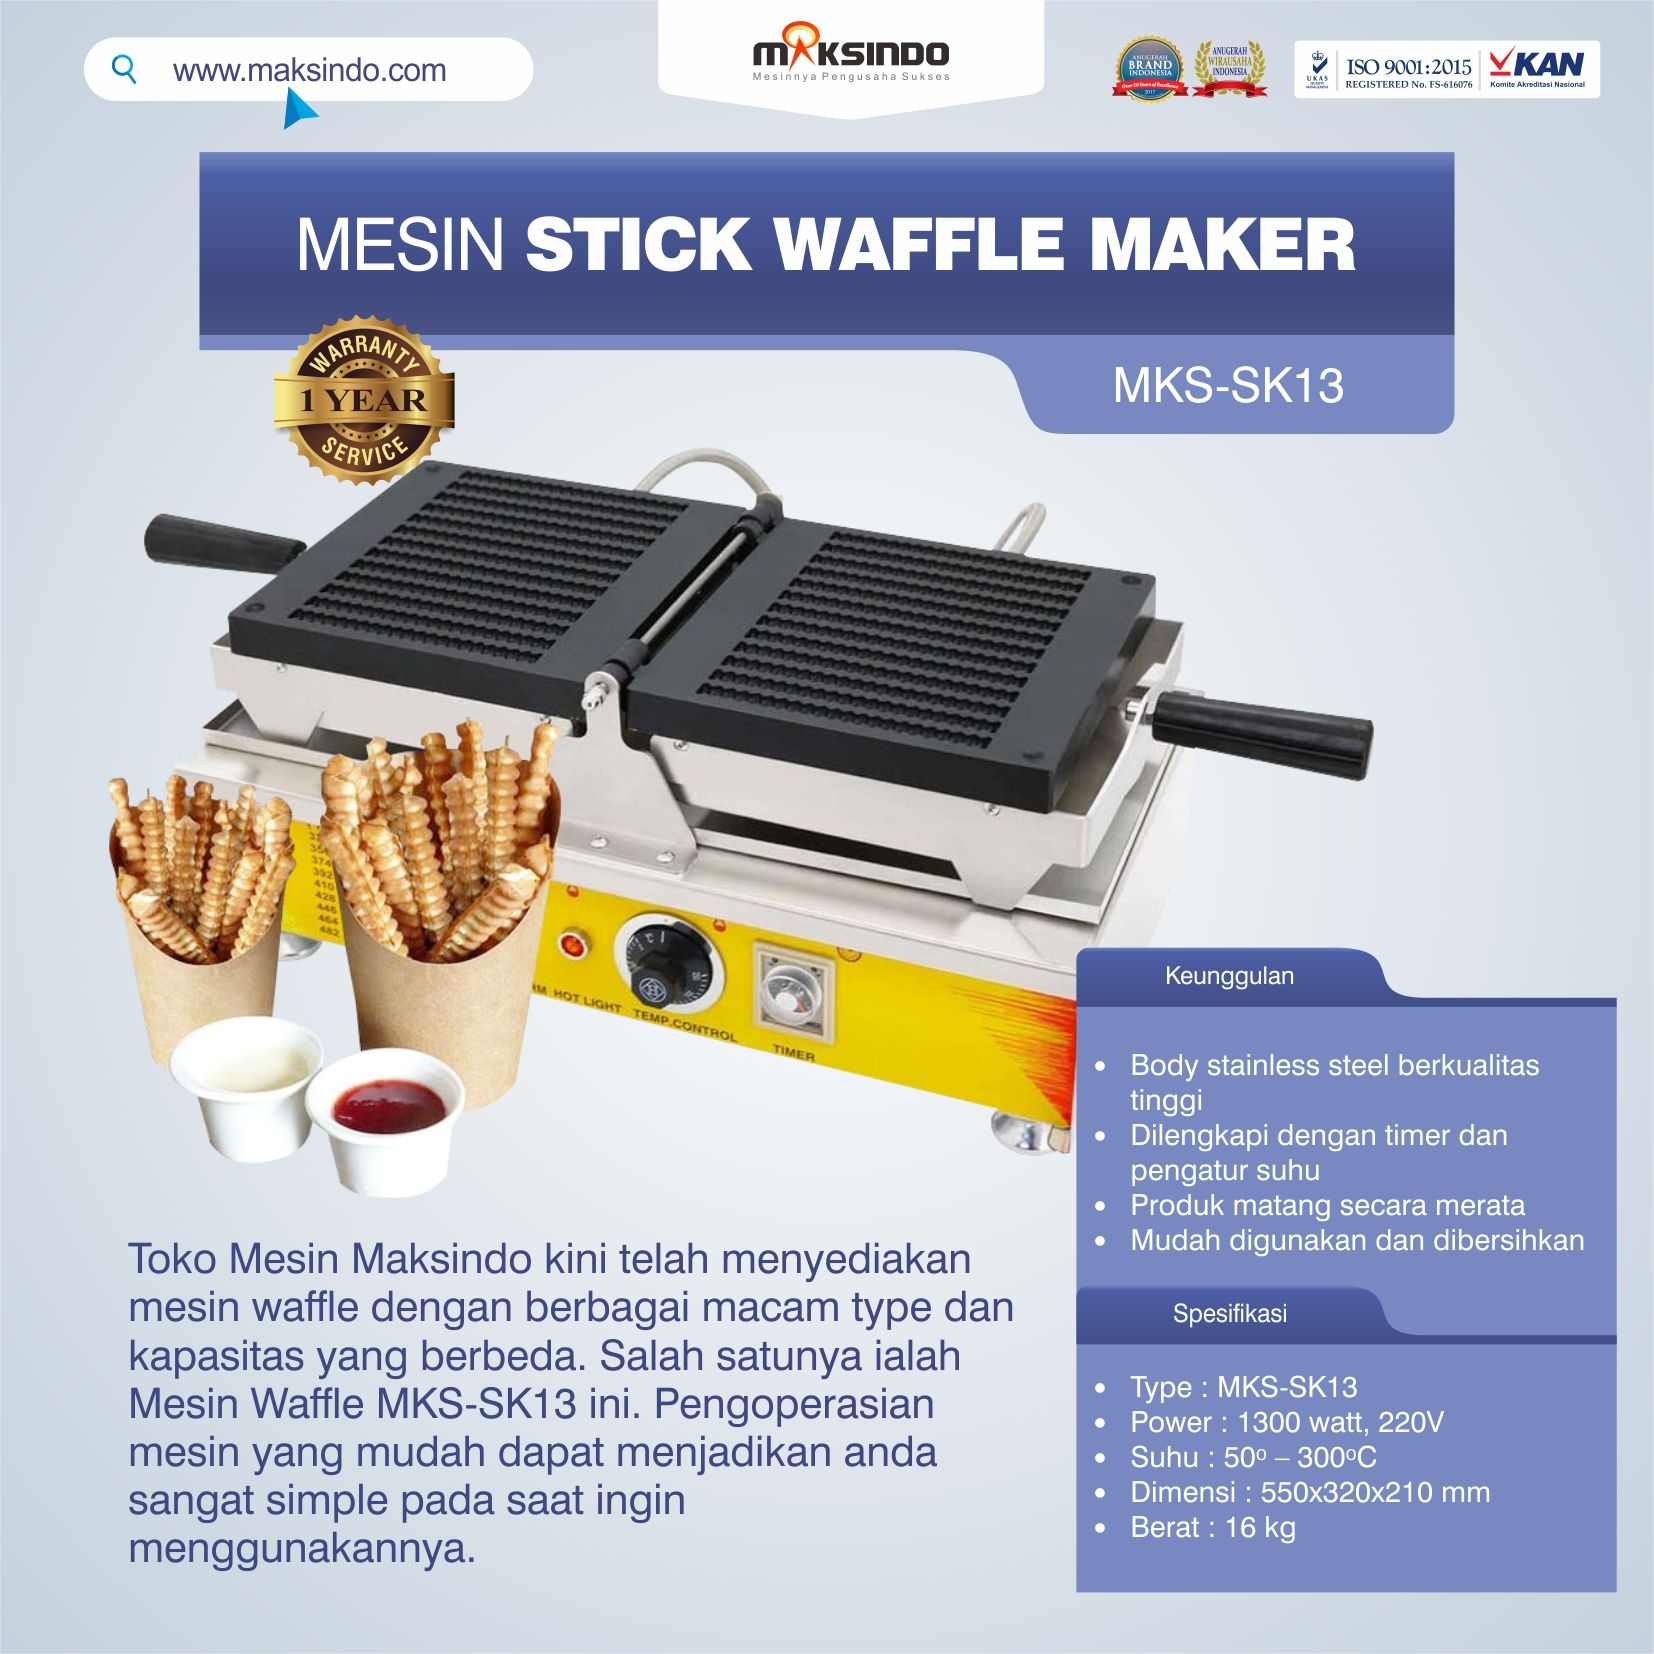 Jual Mesin Stick Waffle Maker MKS-SK13 di Makassar